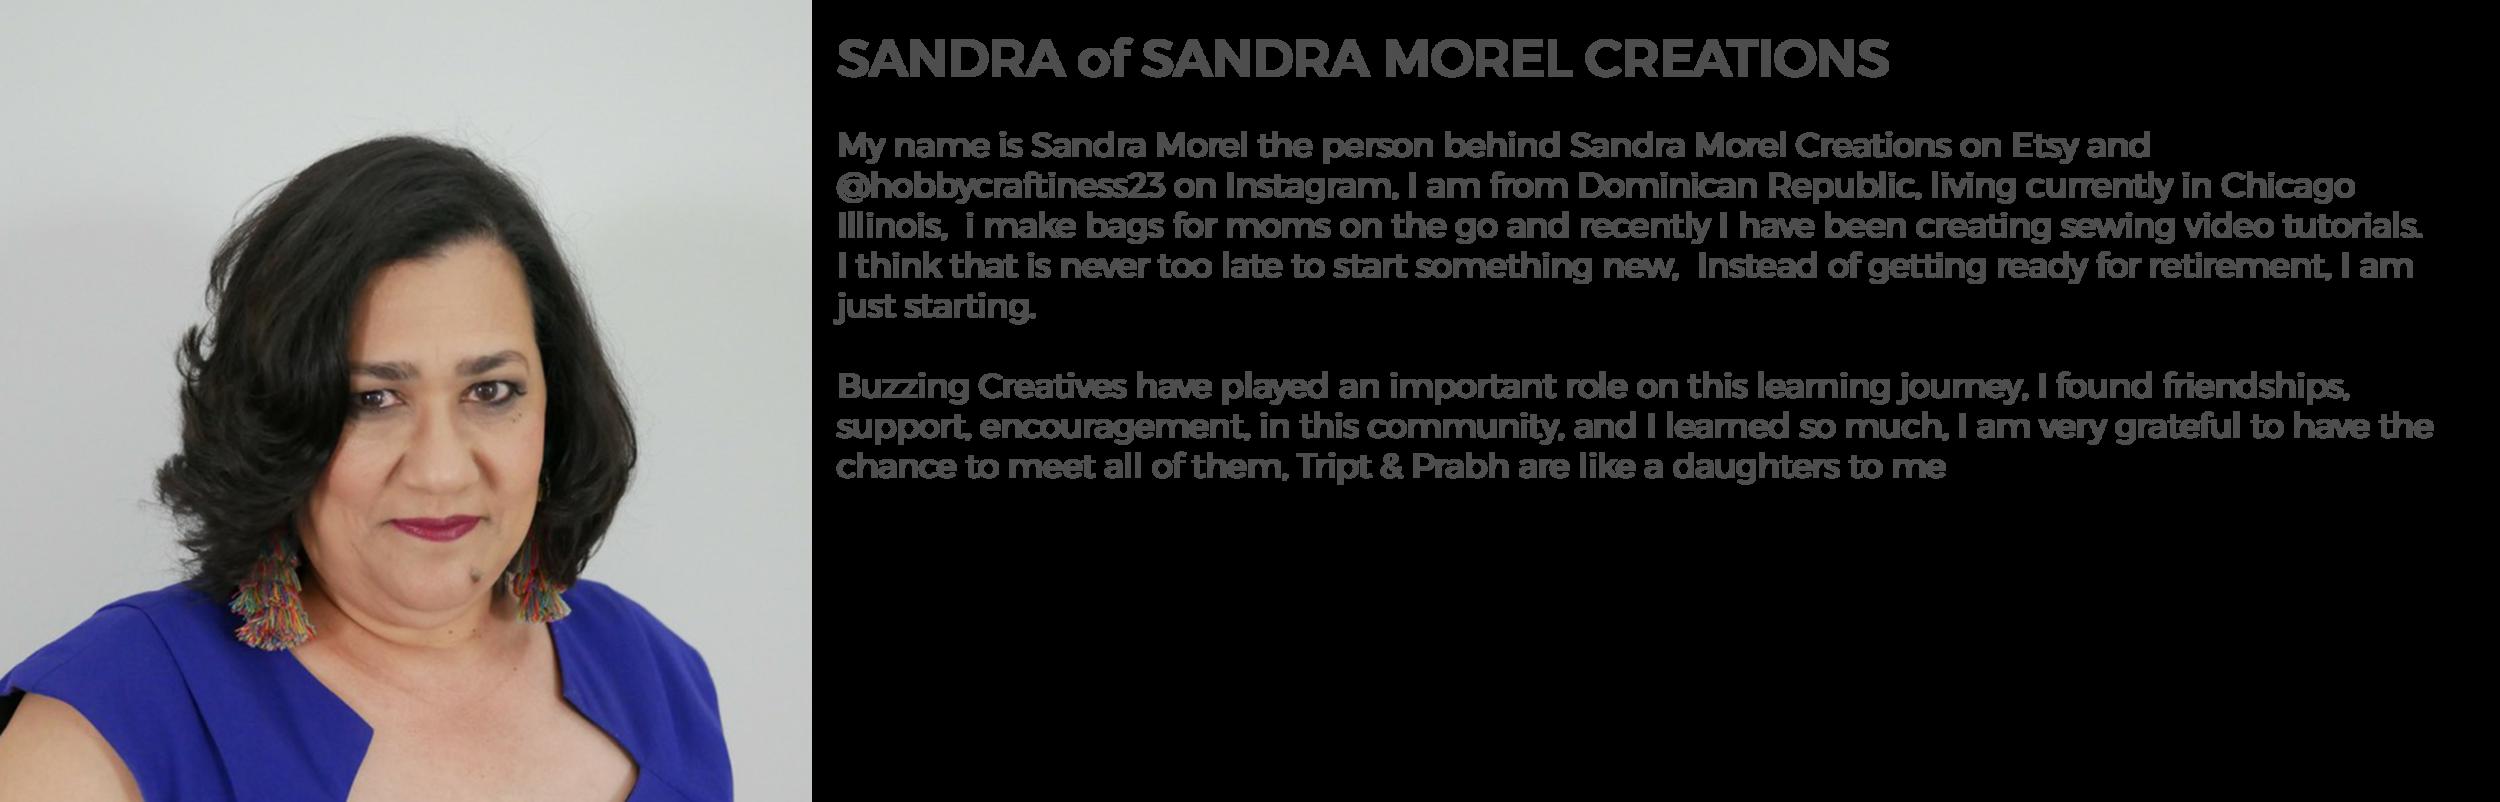 Community Member Sandra of Sandra Morel Creations